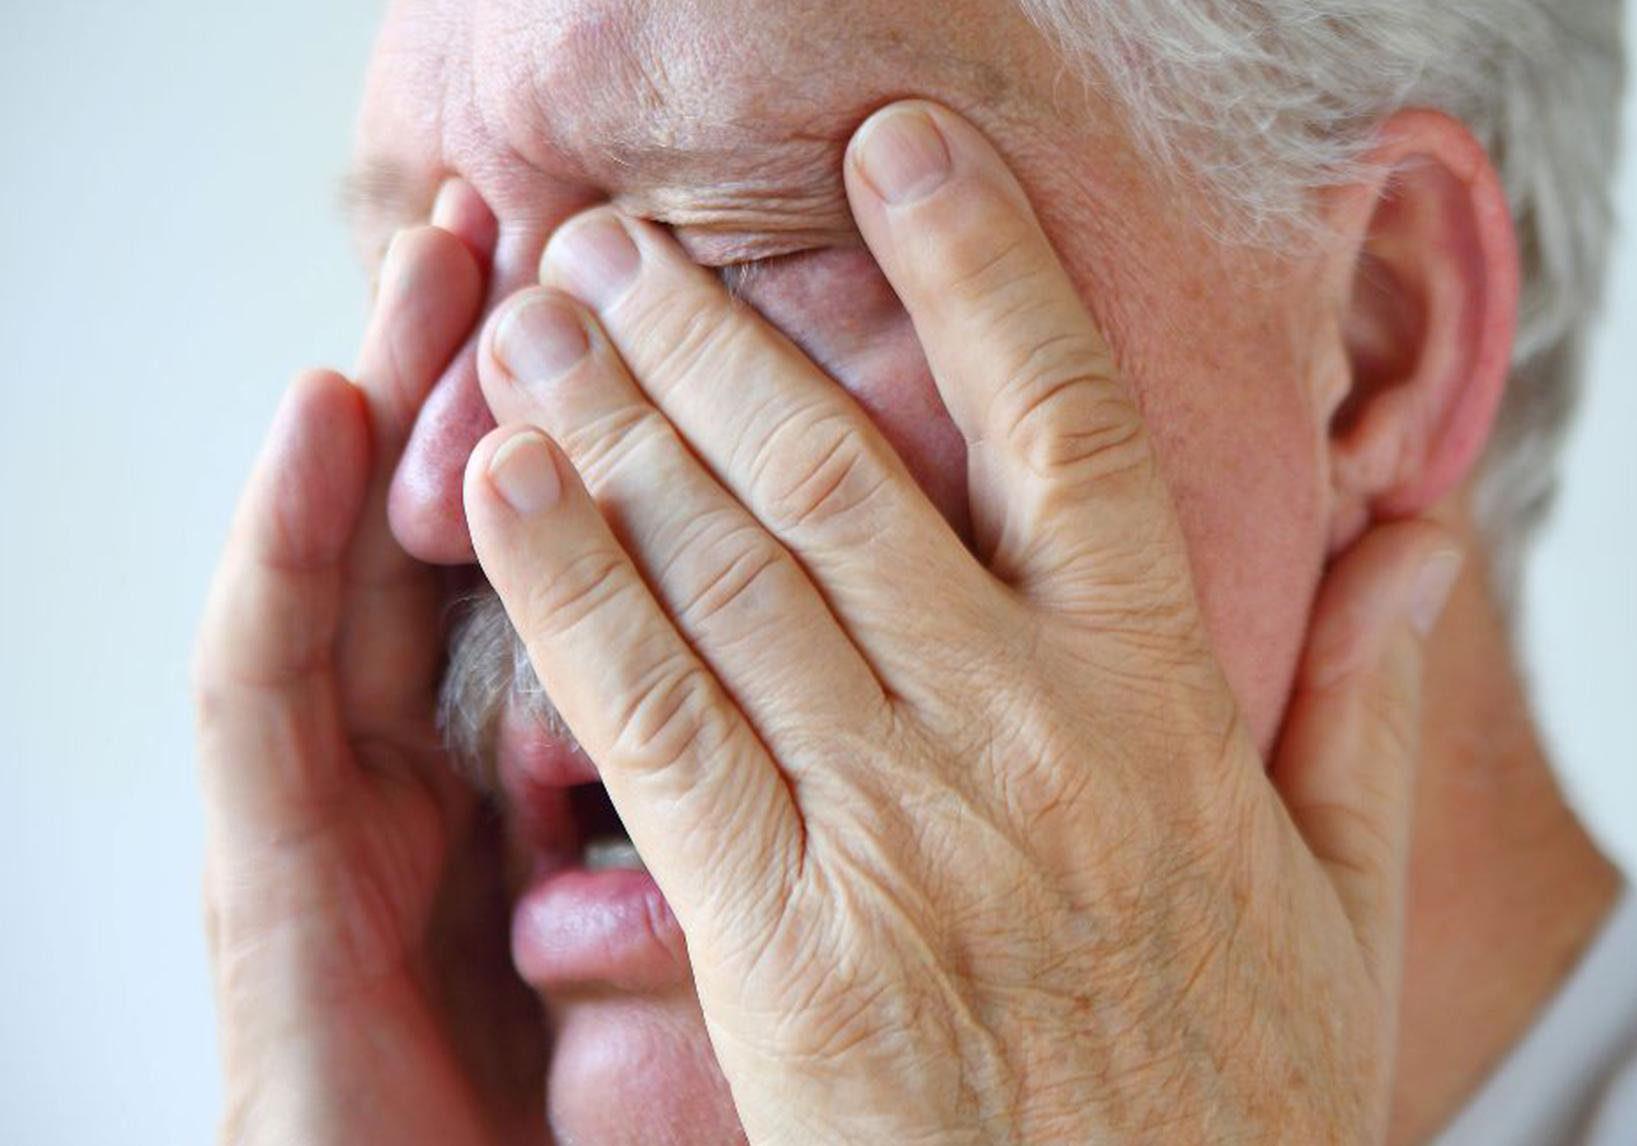 Oregano Oil for Sinus Infection